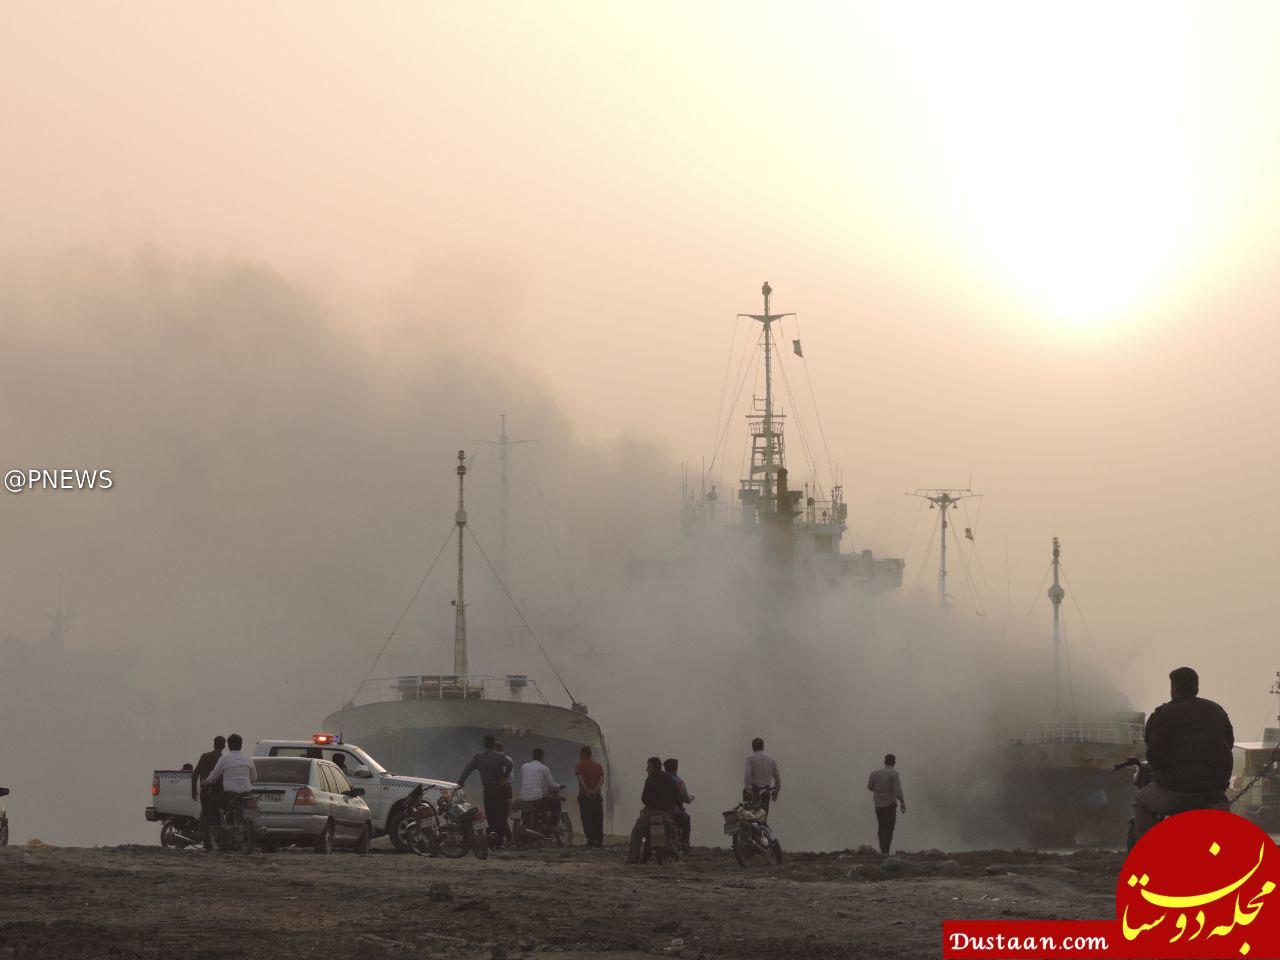 www.dustaan.com آتش گرفتن یک کشتی باری در ساحل گناوه +عکس